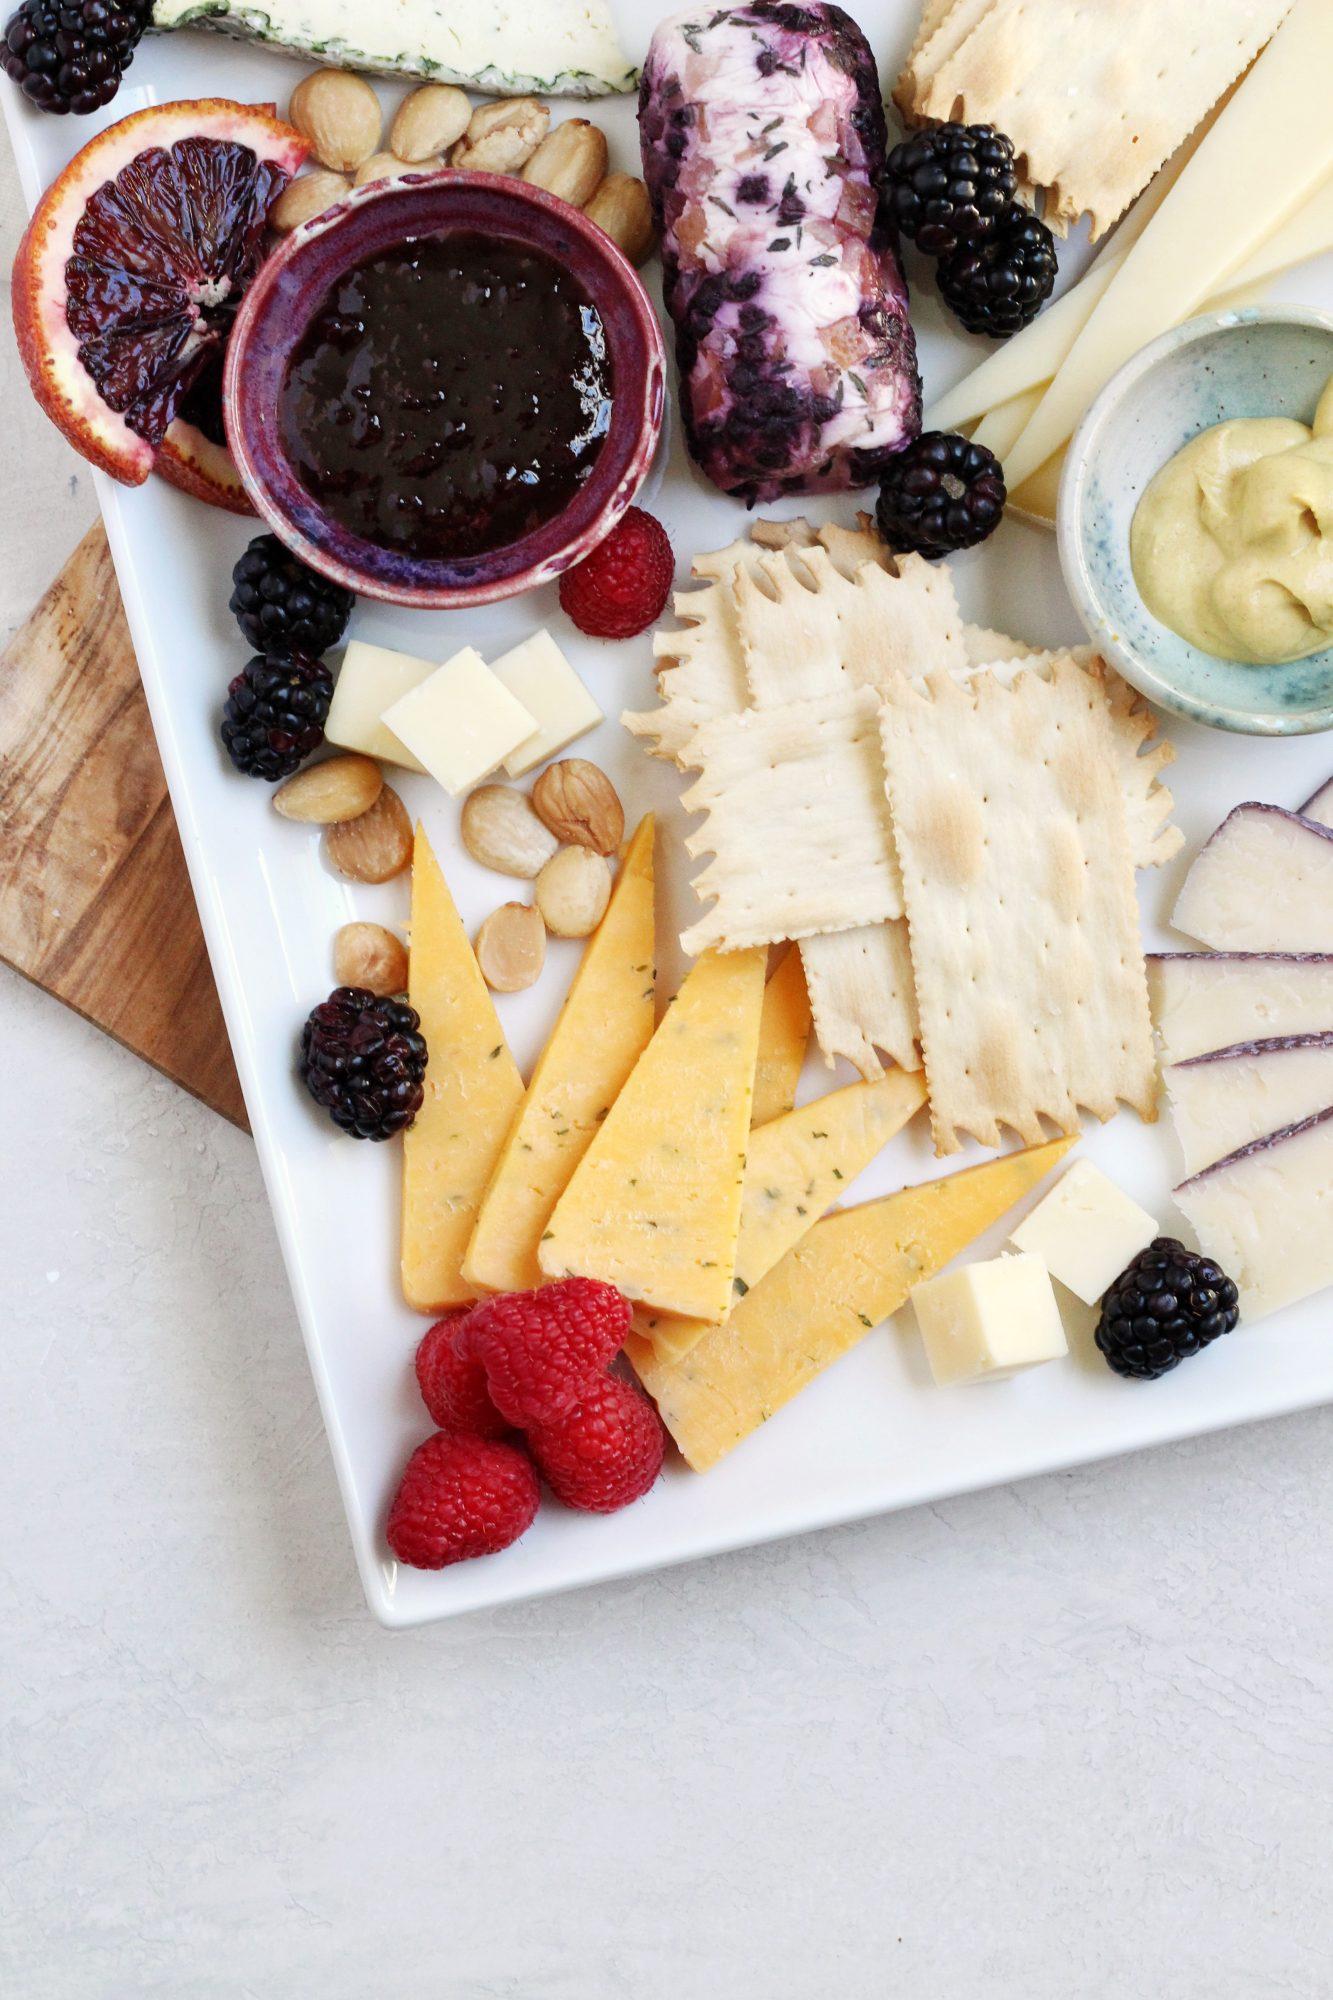 Accompaniments for cheese board ideas